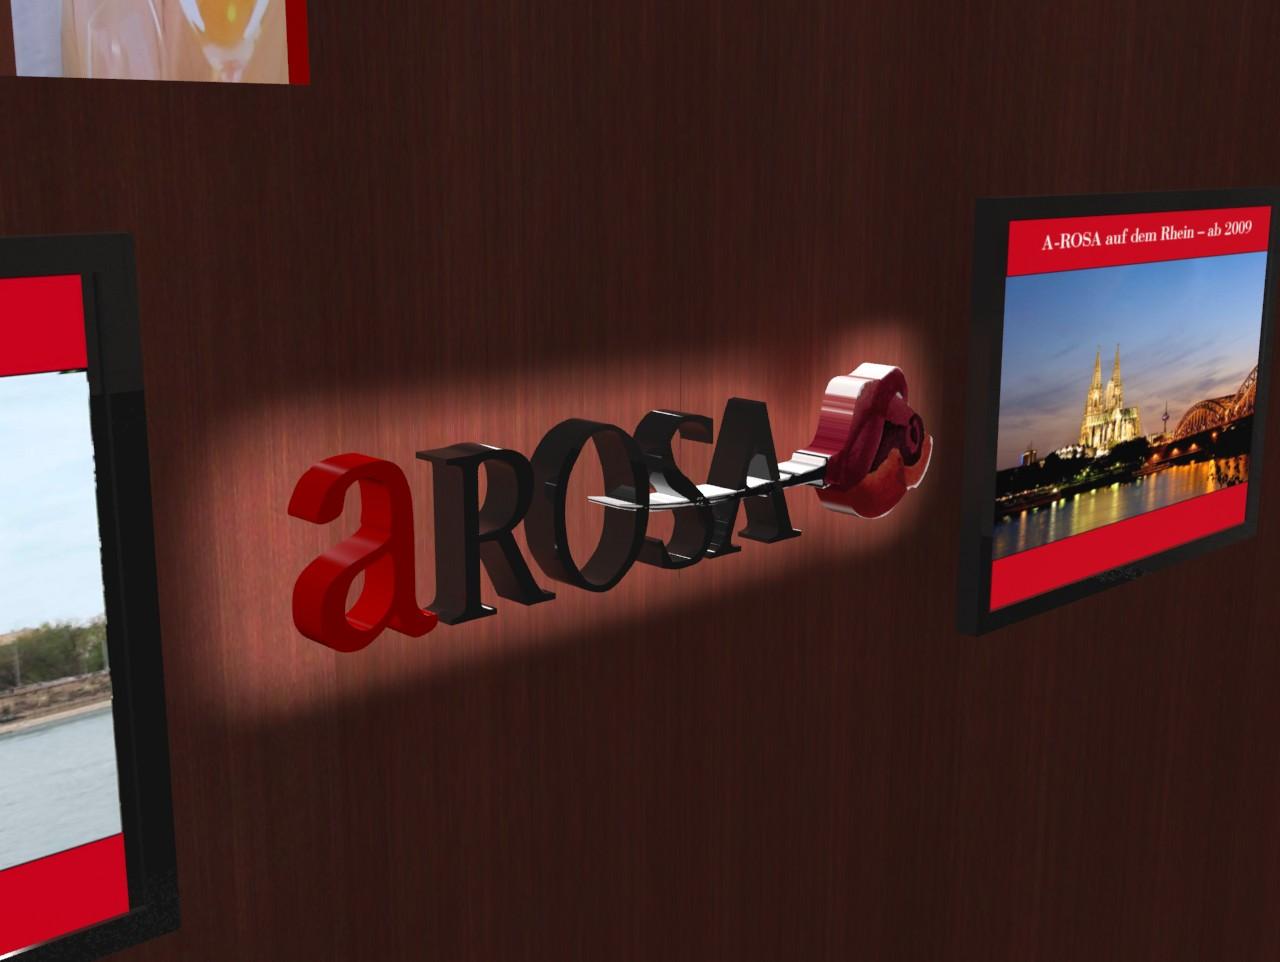 ArosaLED A1 Rahmen+Logo detail